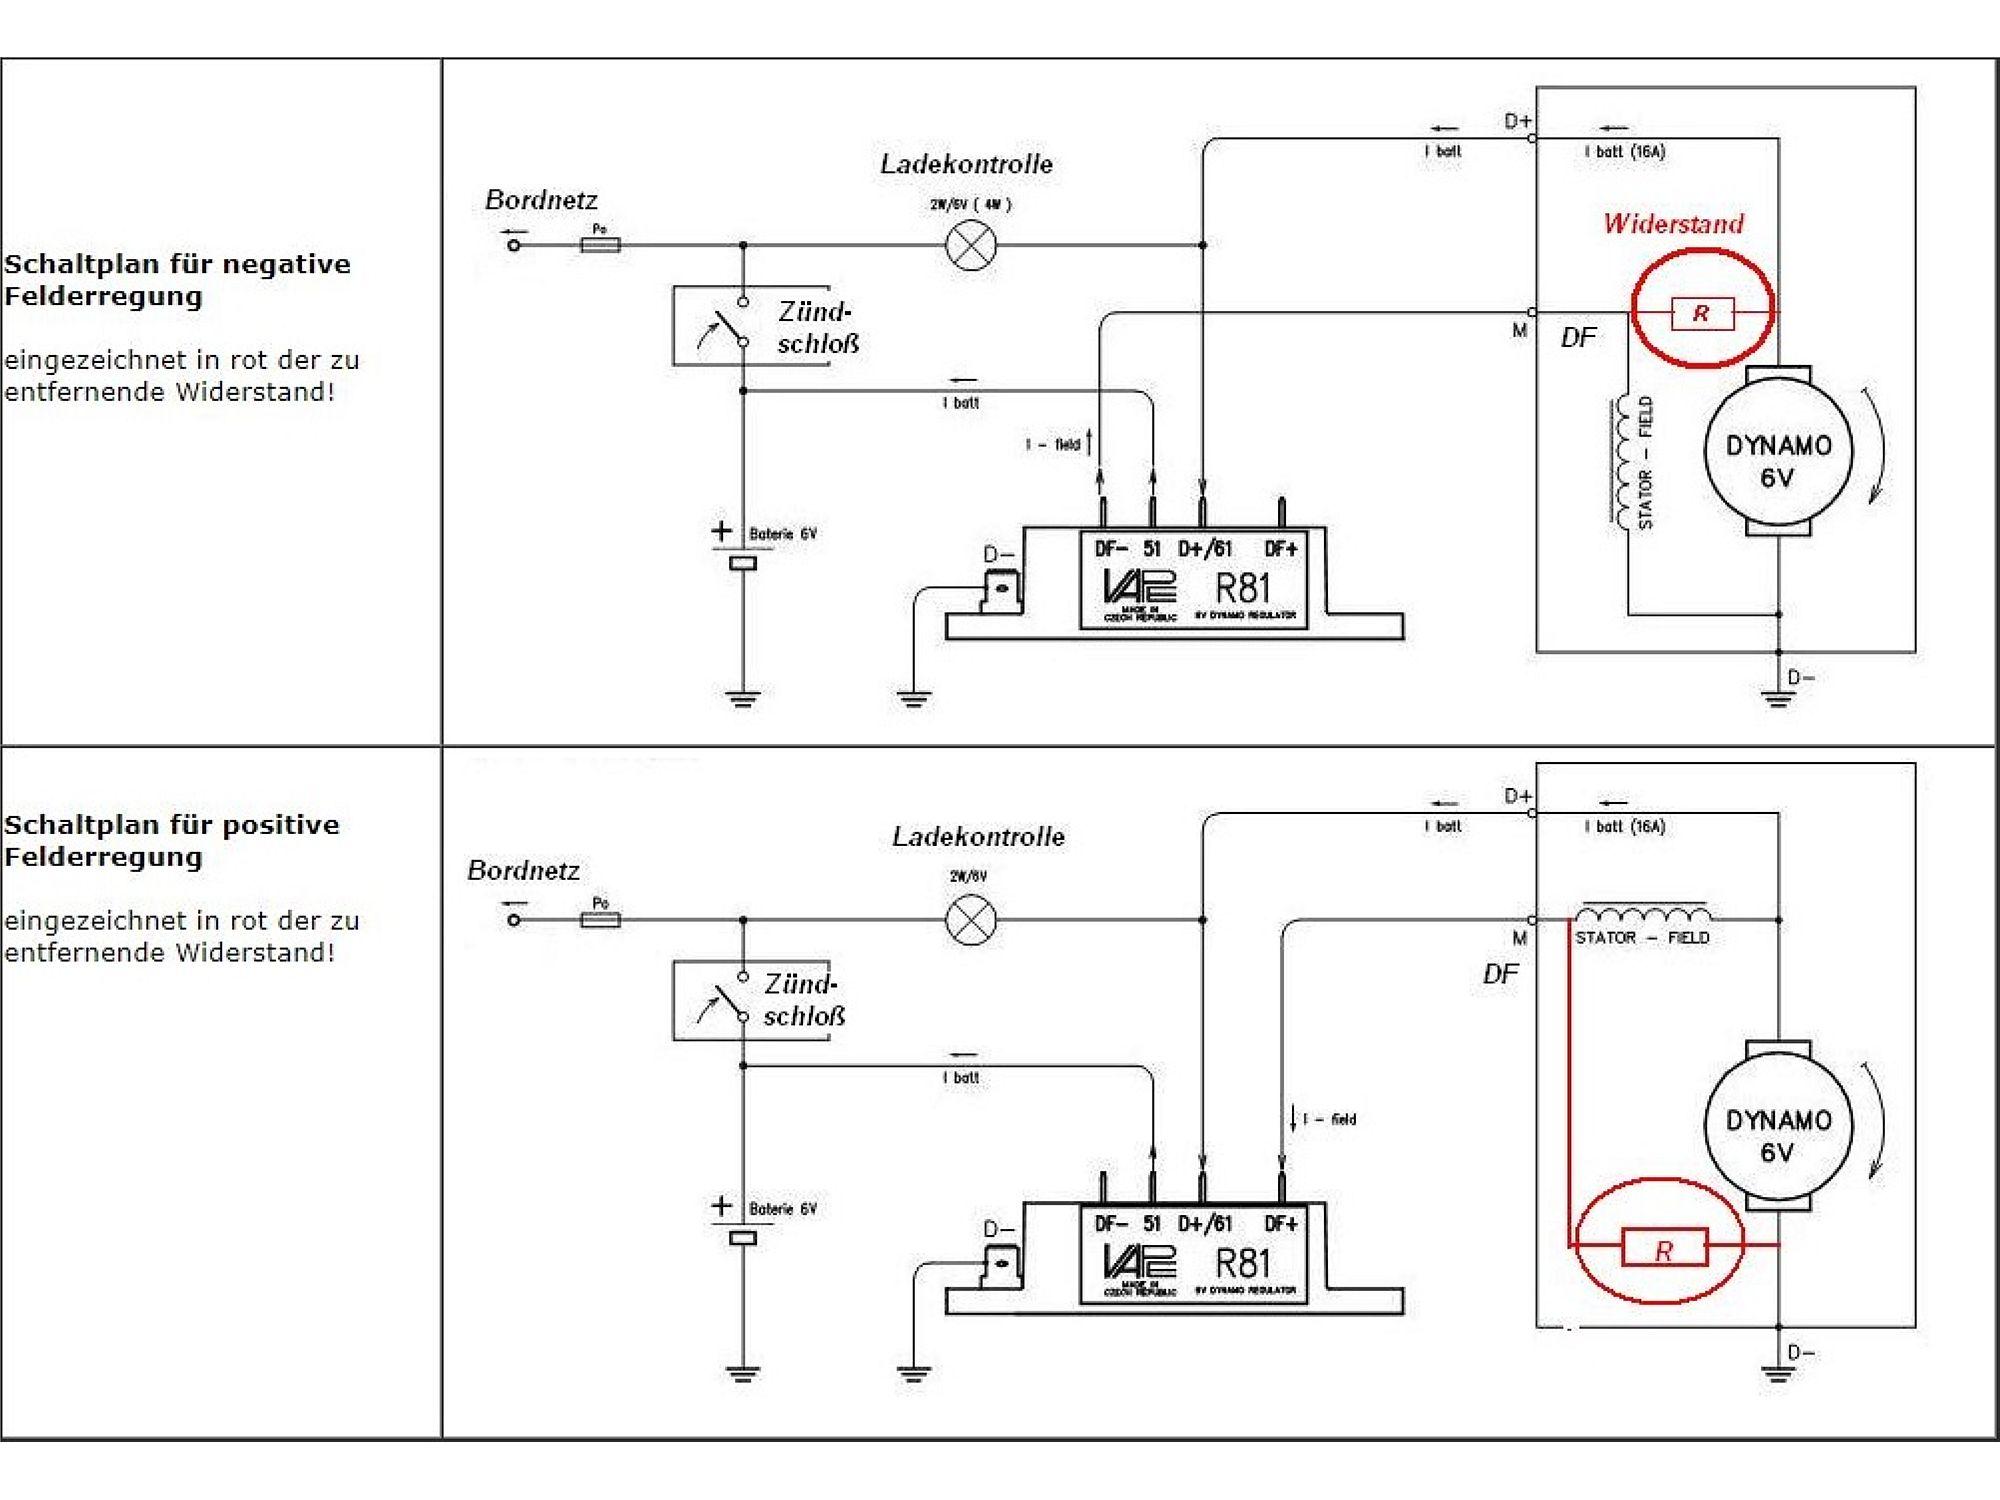 integral voltage regulator wiring diagram wiring diagram Generator Voltage Regulator Wiring Diagram integral voltage regulator wiring diagram wiring diagramintegral voltage regulator wiring diagram